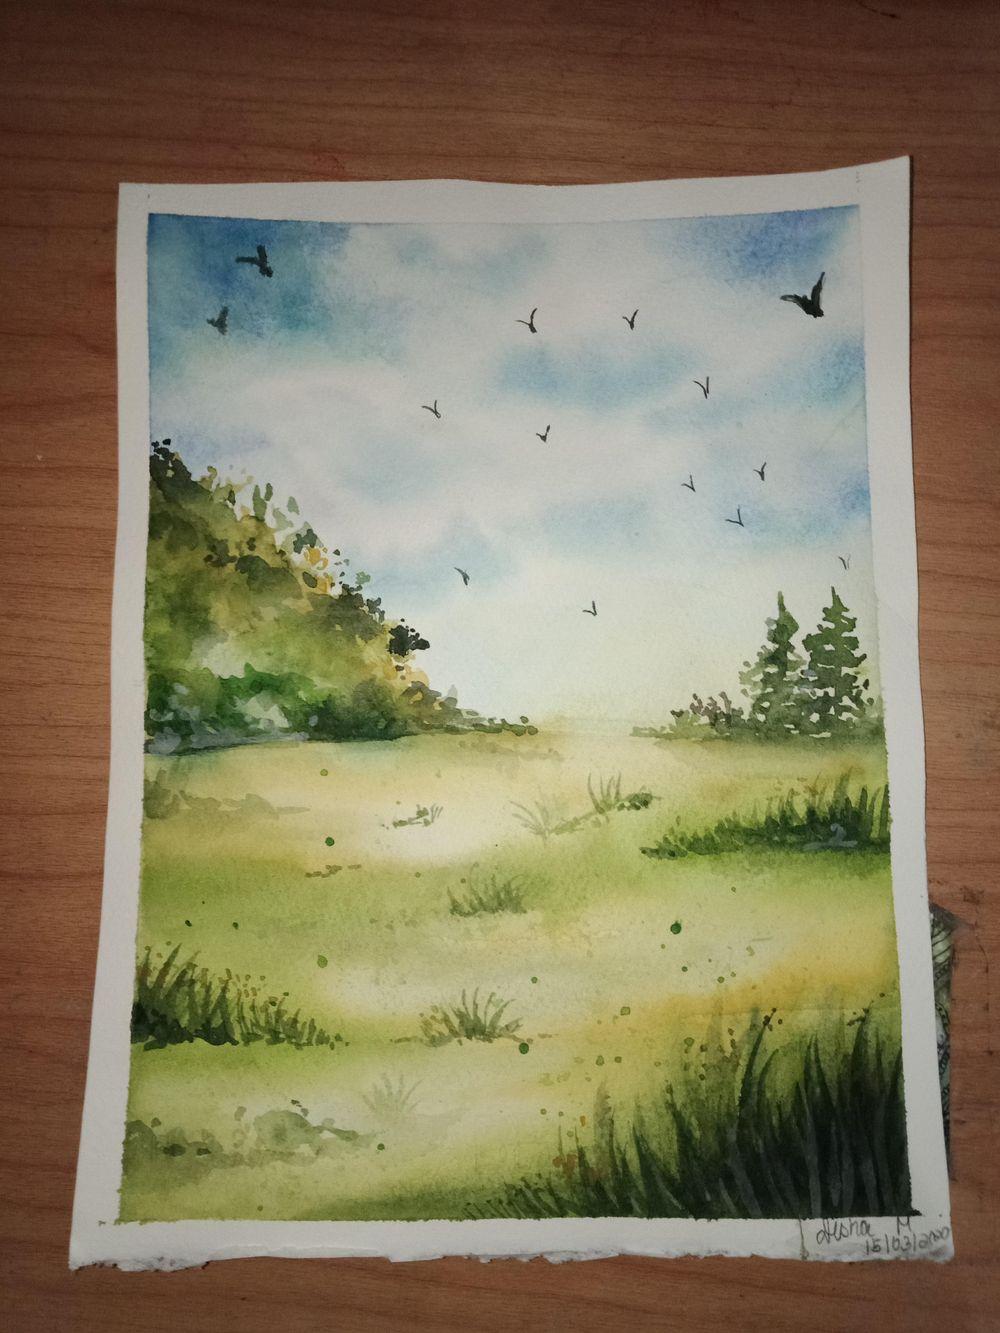 Green watercolour landscape - image 1 - student project